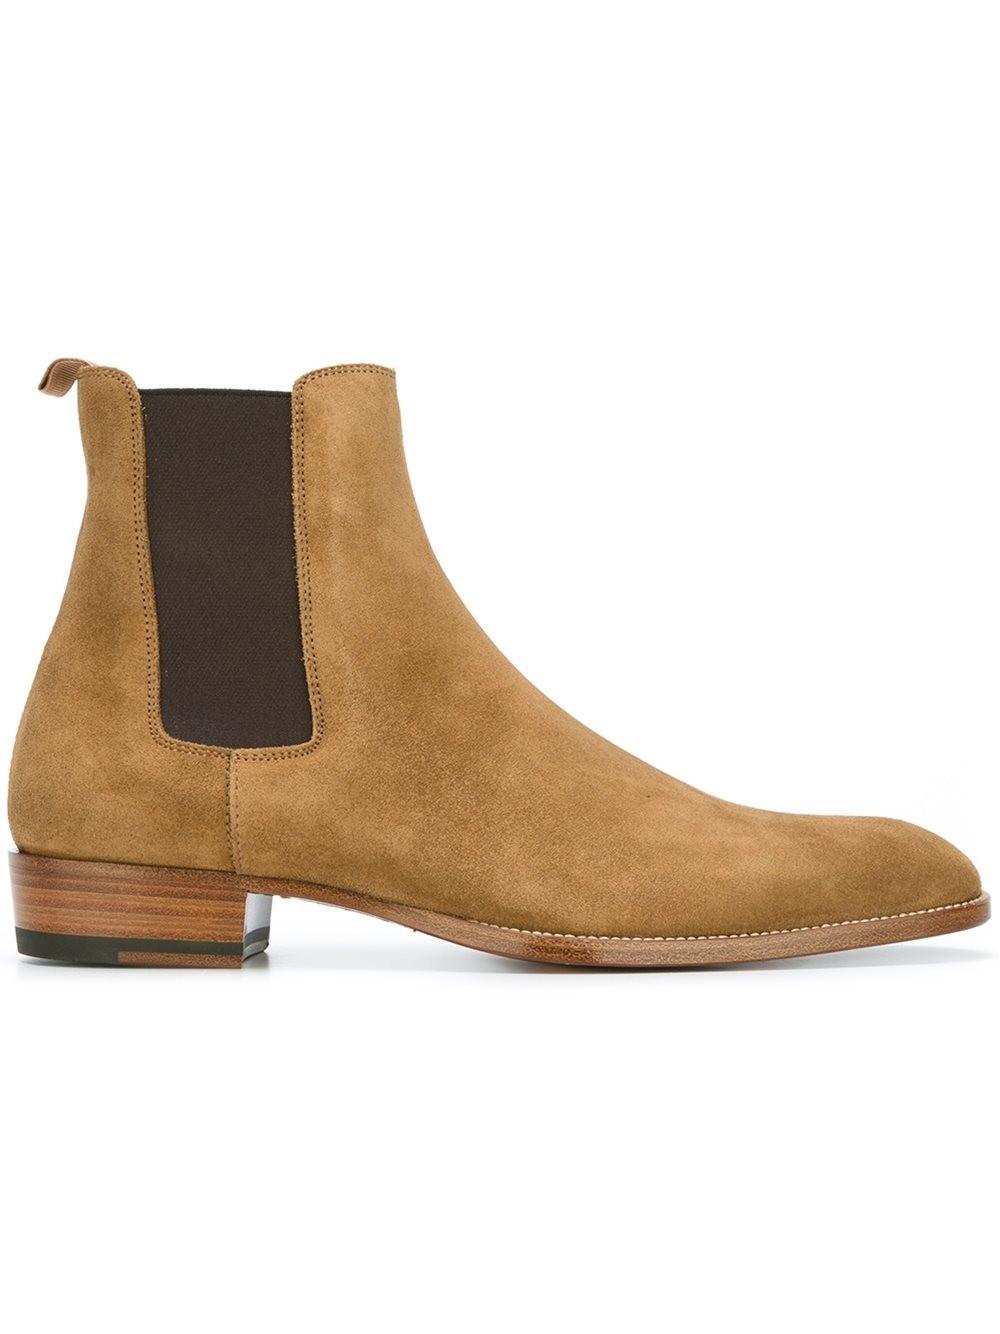 SAINT LAURENT Wyatt Suede Chelsea Ankle Boots, Light Brown